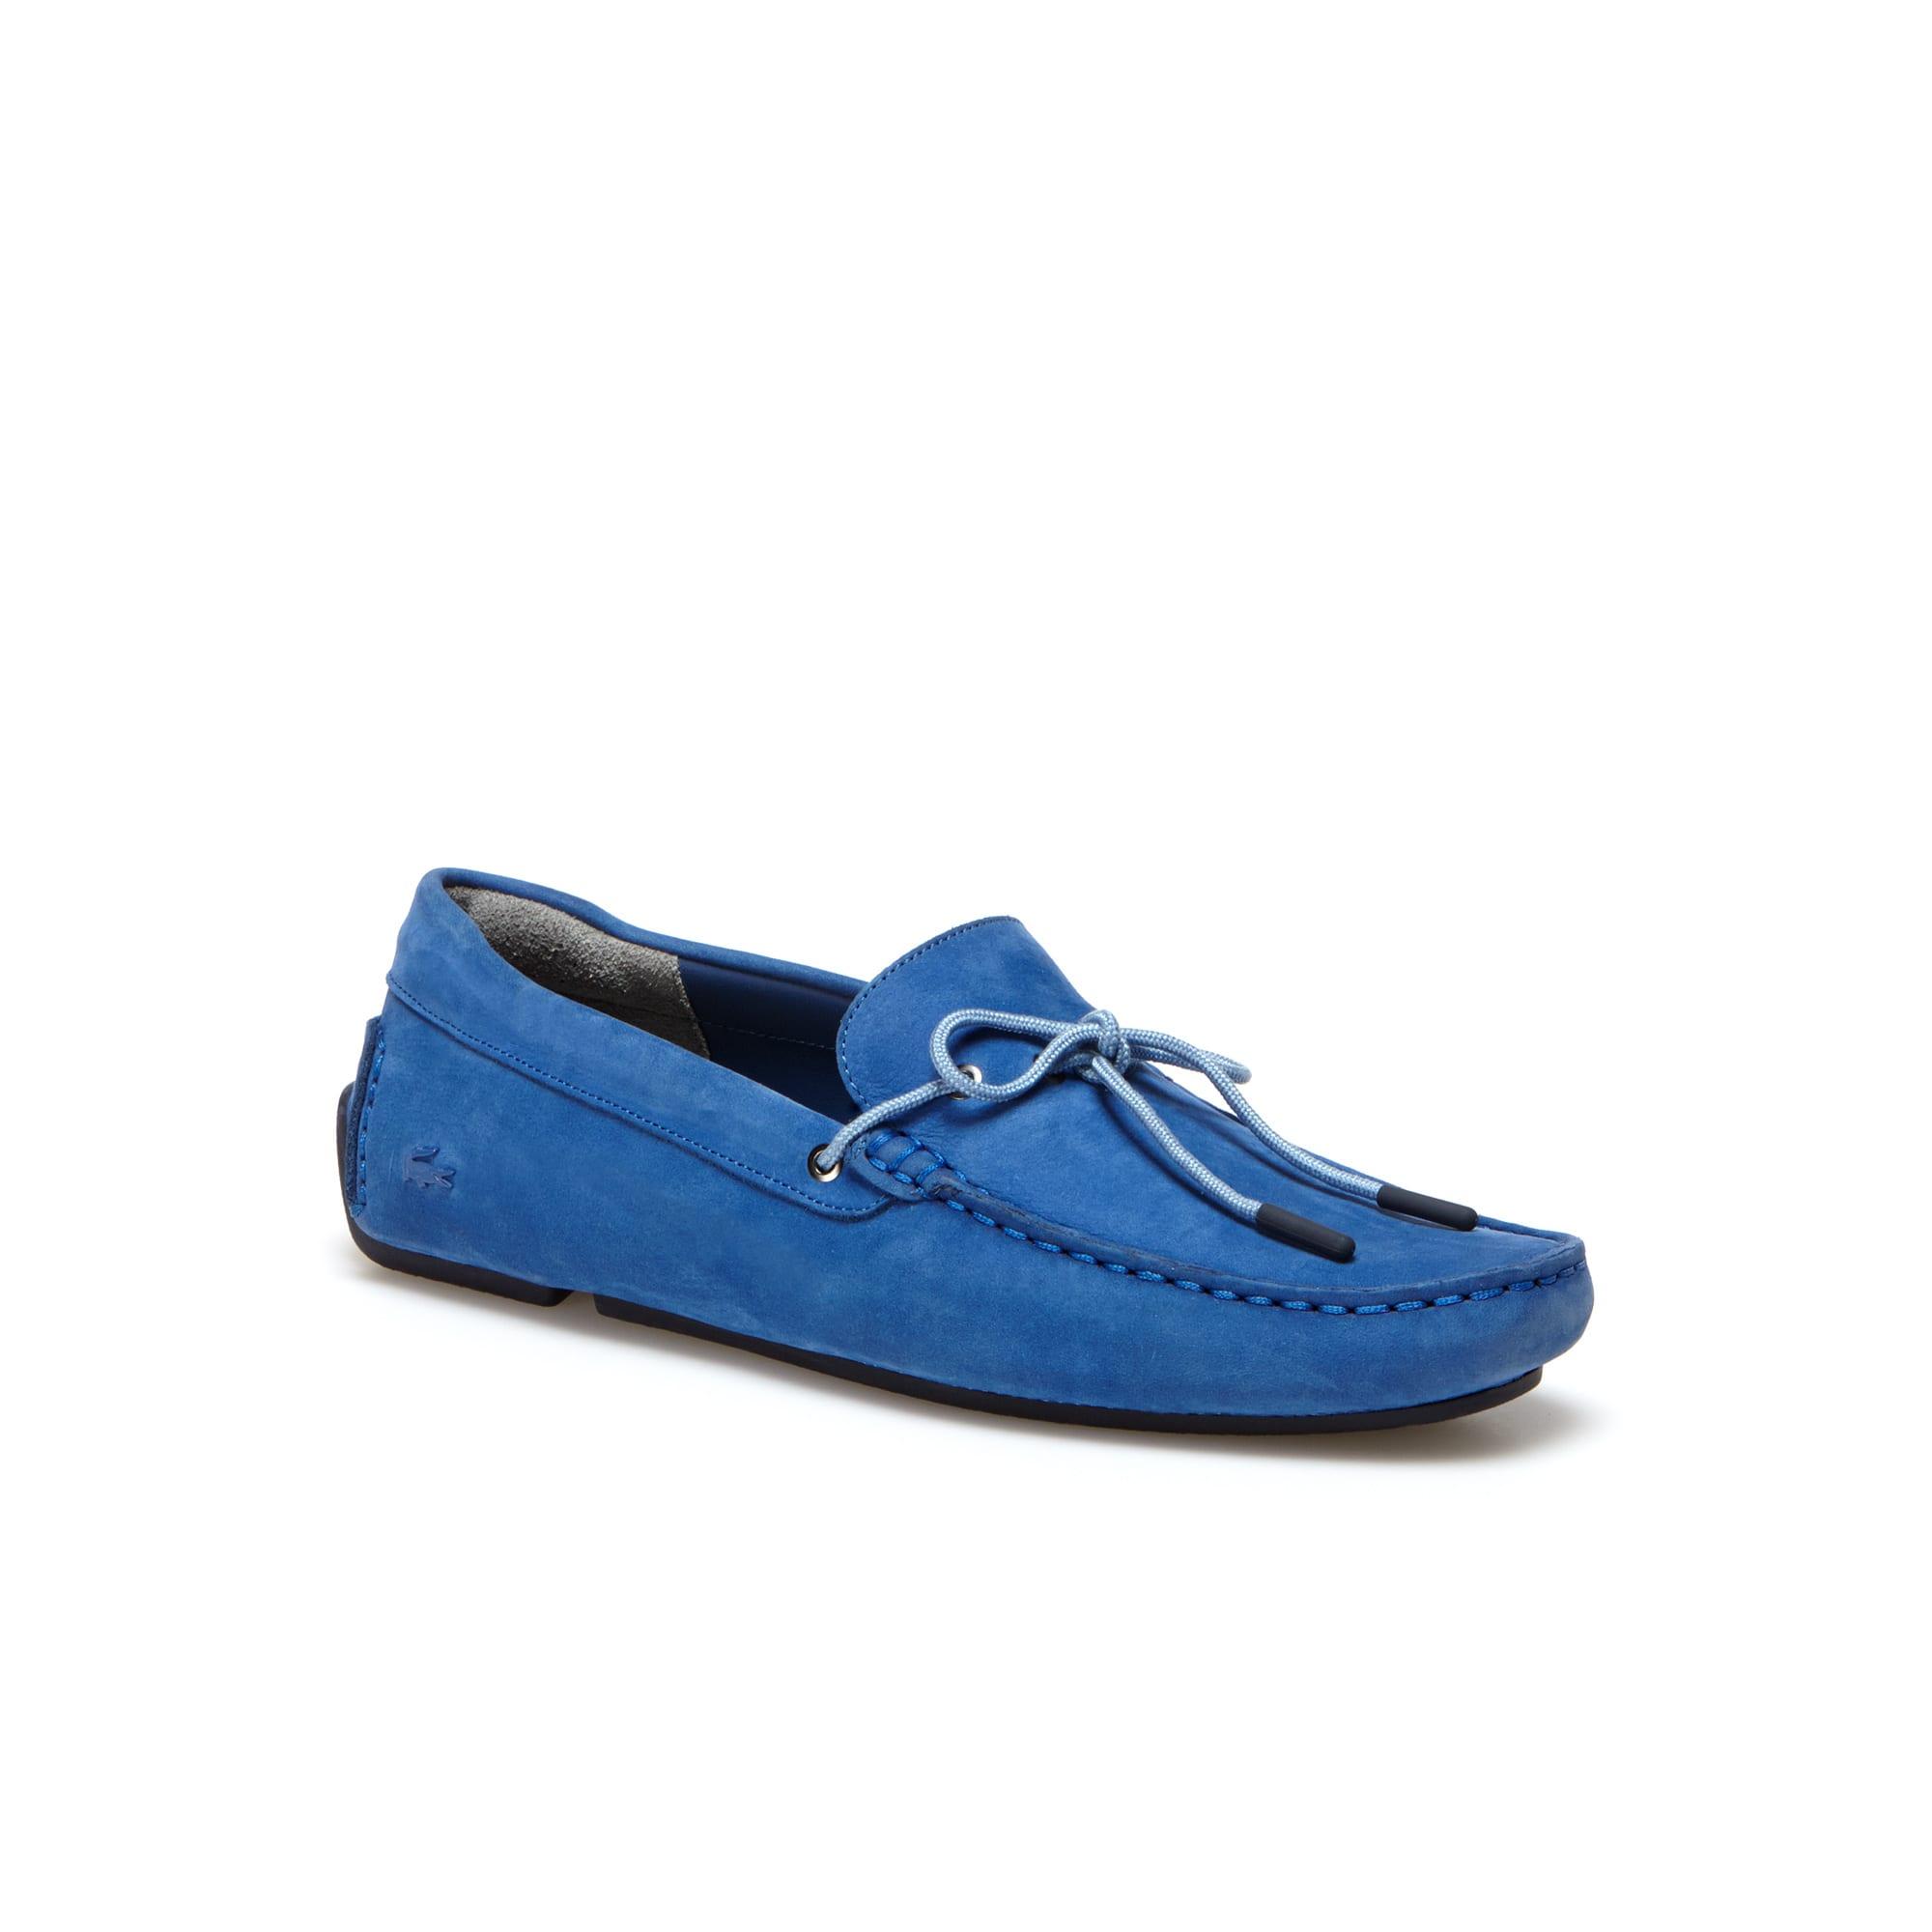 Men's Piloter Corde Suede Loafers